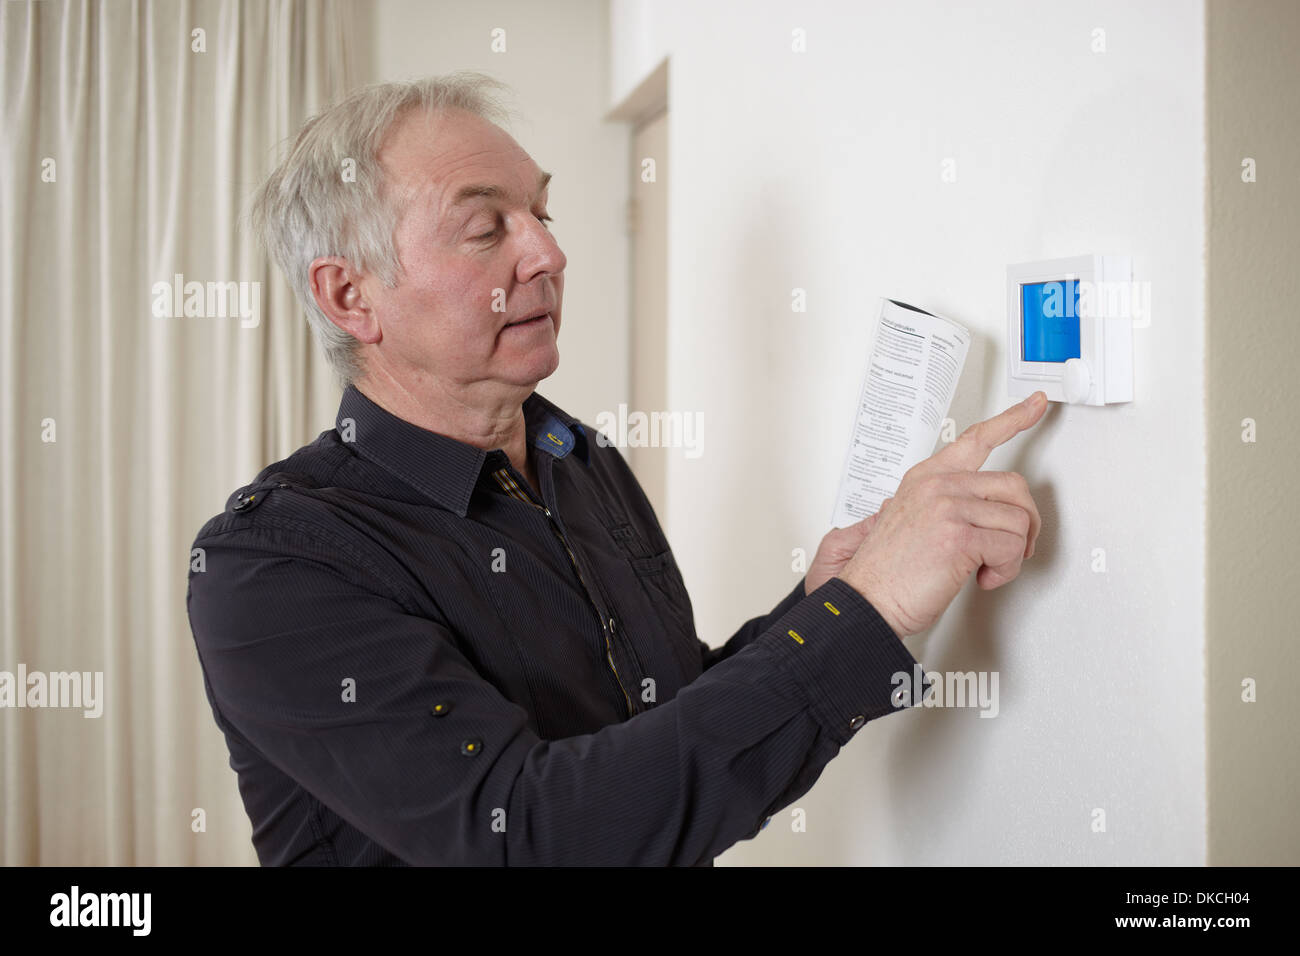 Senior man at home adjusting heating control panel - Stock Image